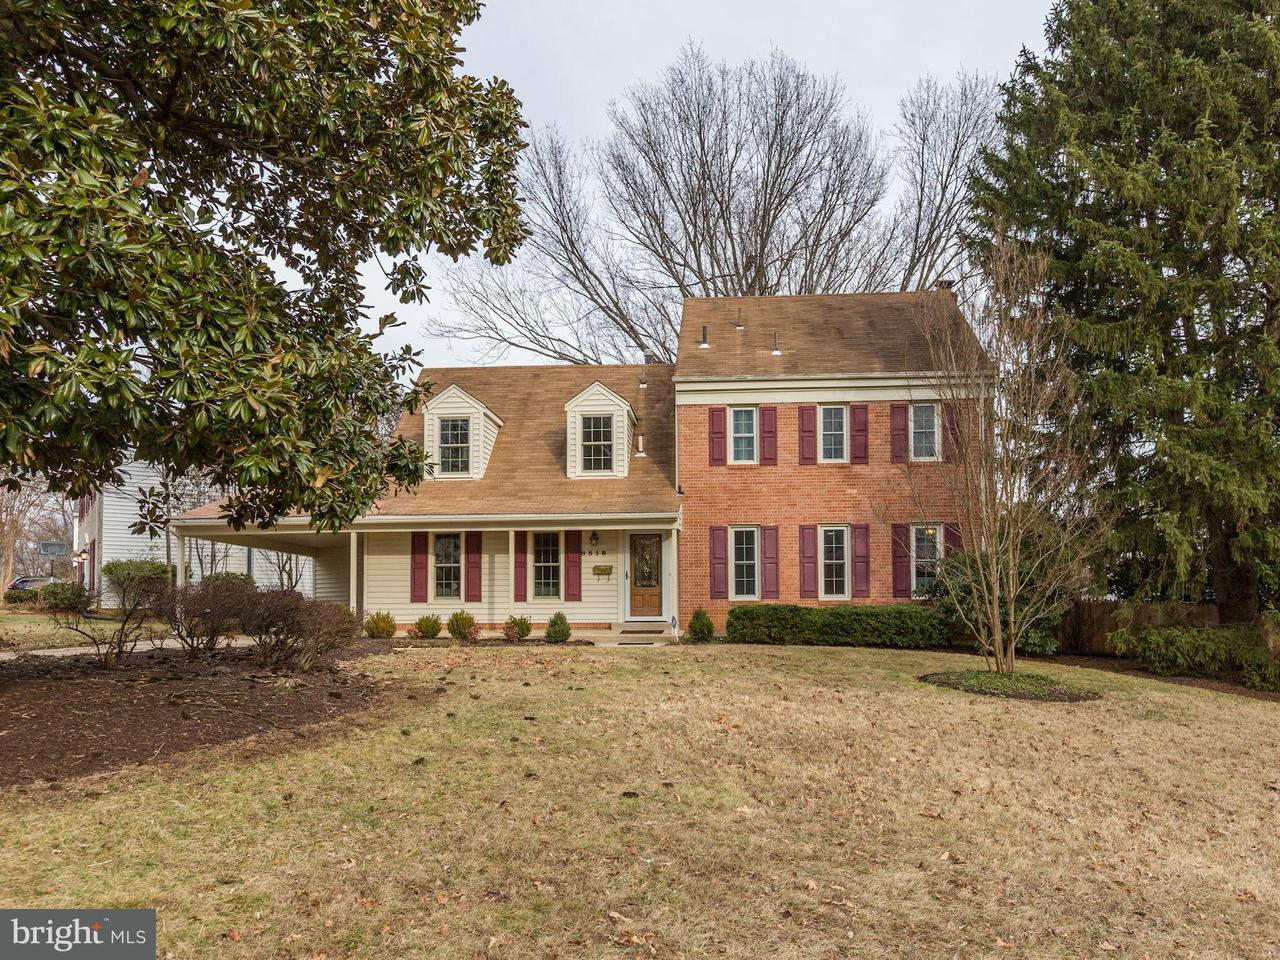 Single Family Home for Sale at 8518 Postoak Road 8518 Postoak Road Potomac, Maryland 20854 United States